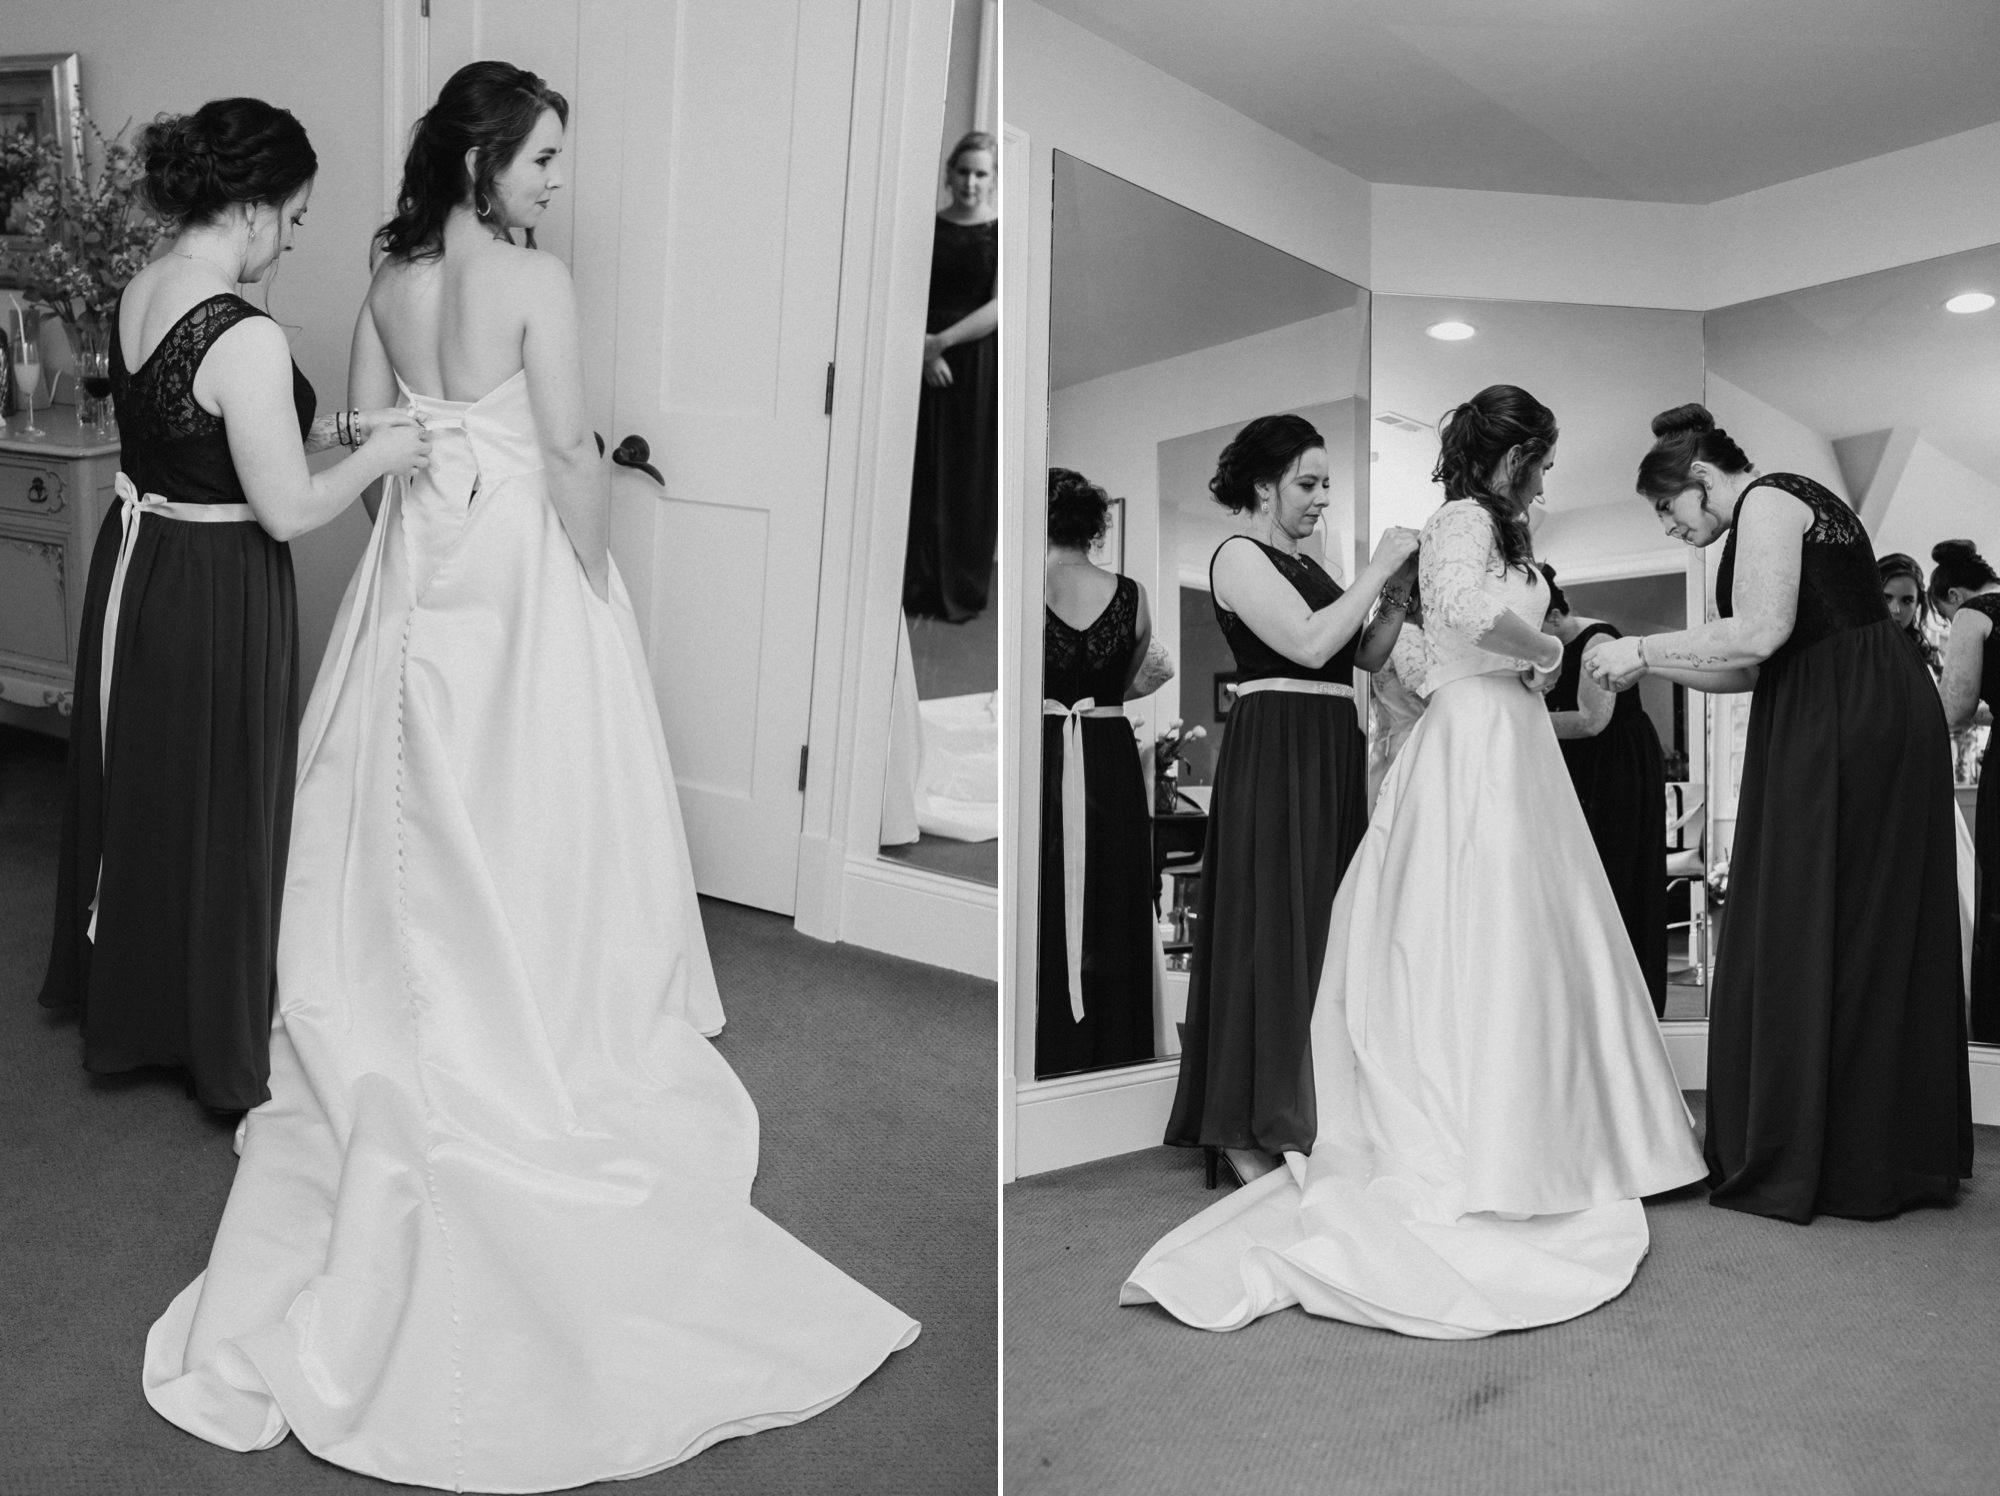 wedding-photography-virginia_0007.jpg